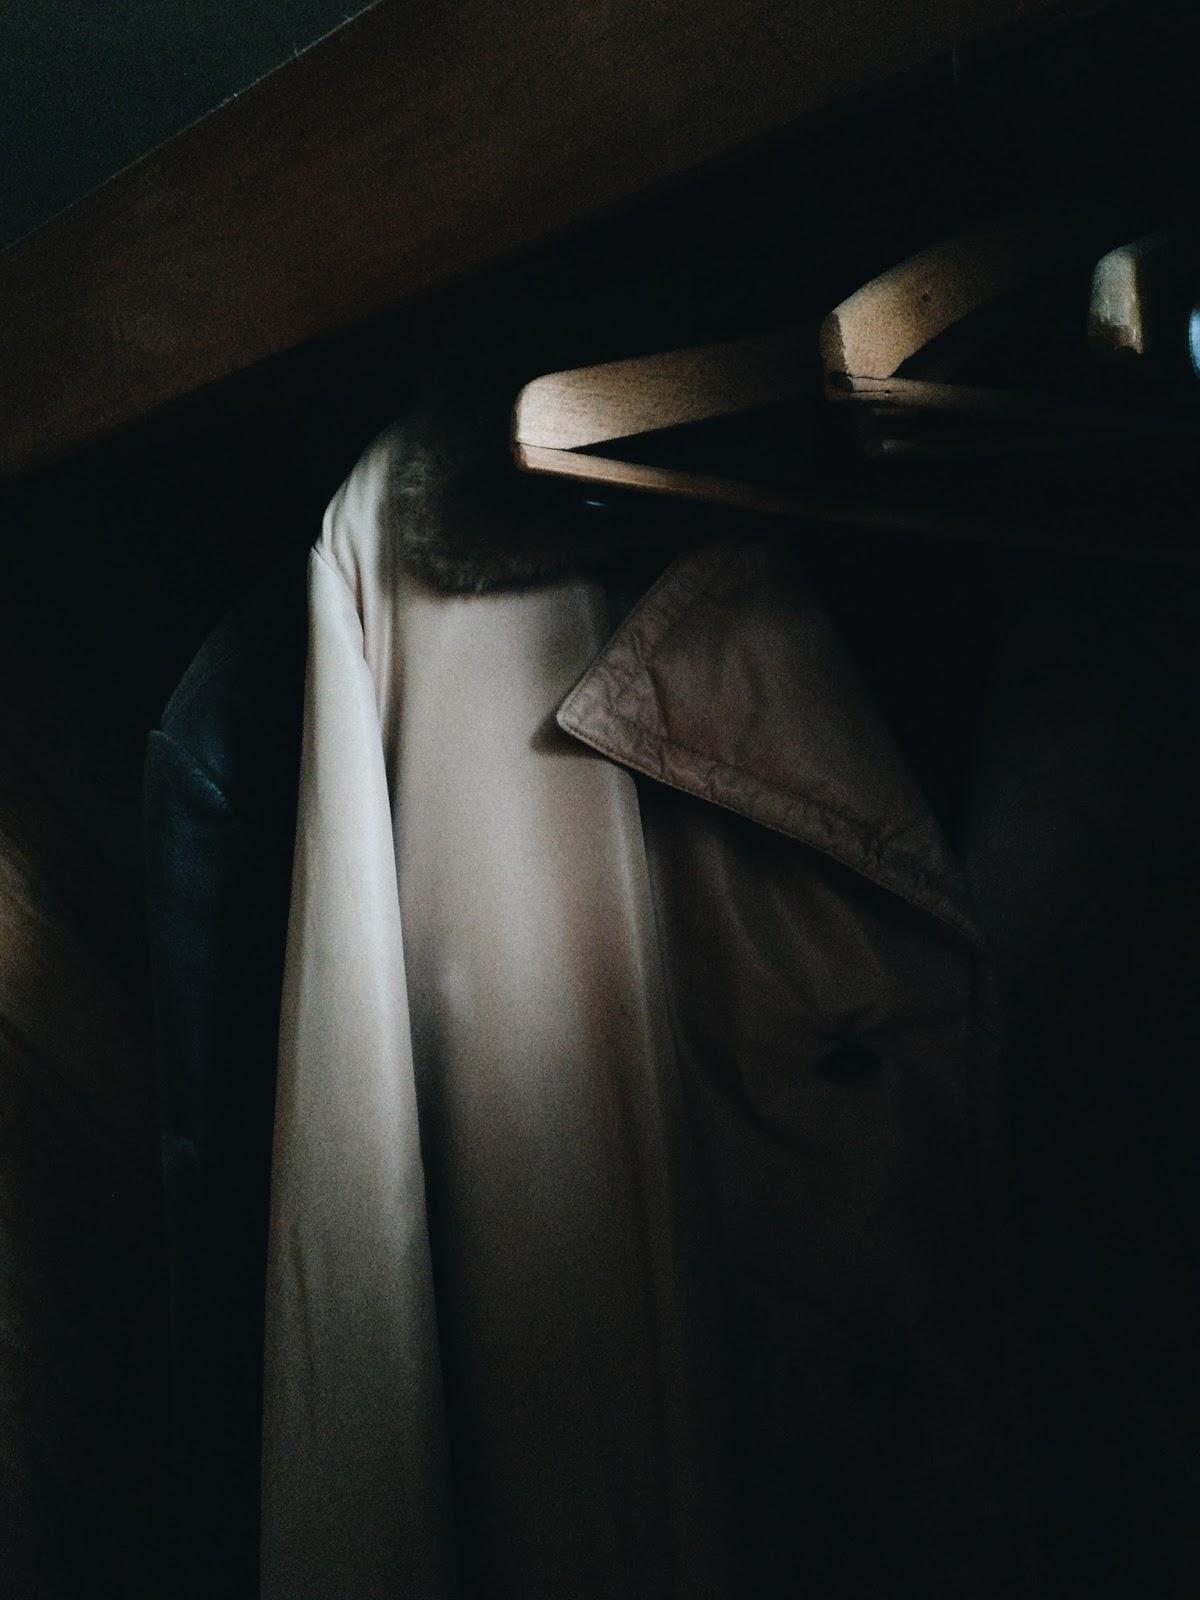 Kabáty ve skříni